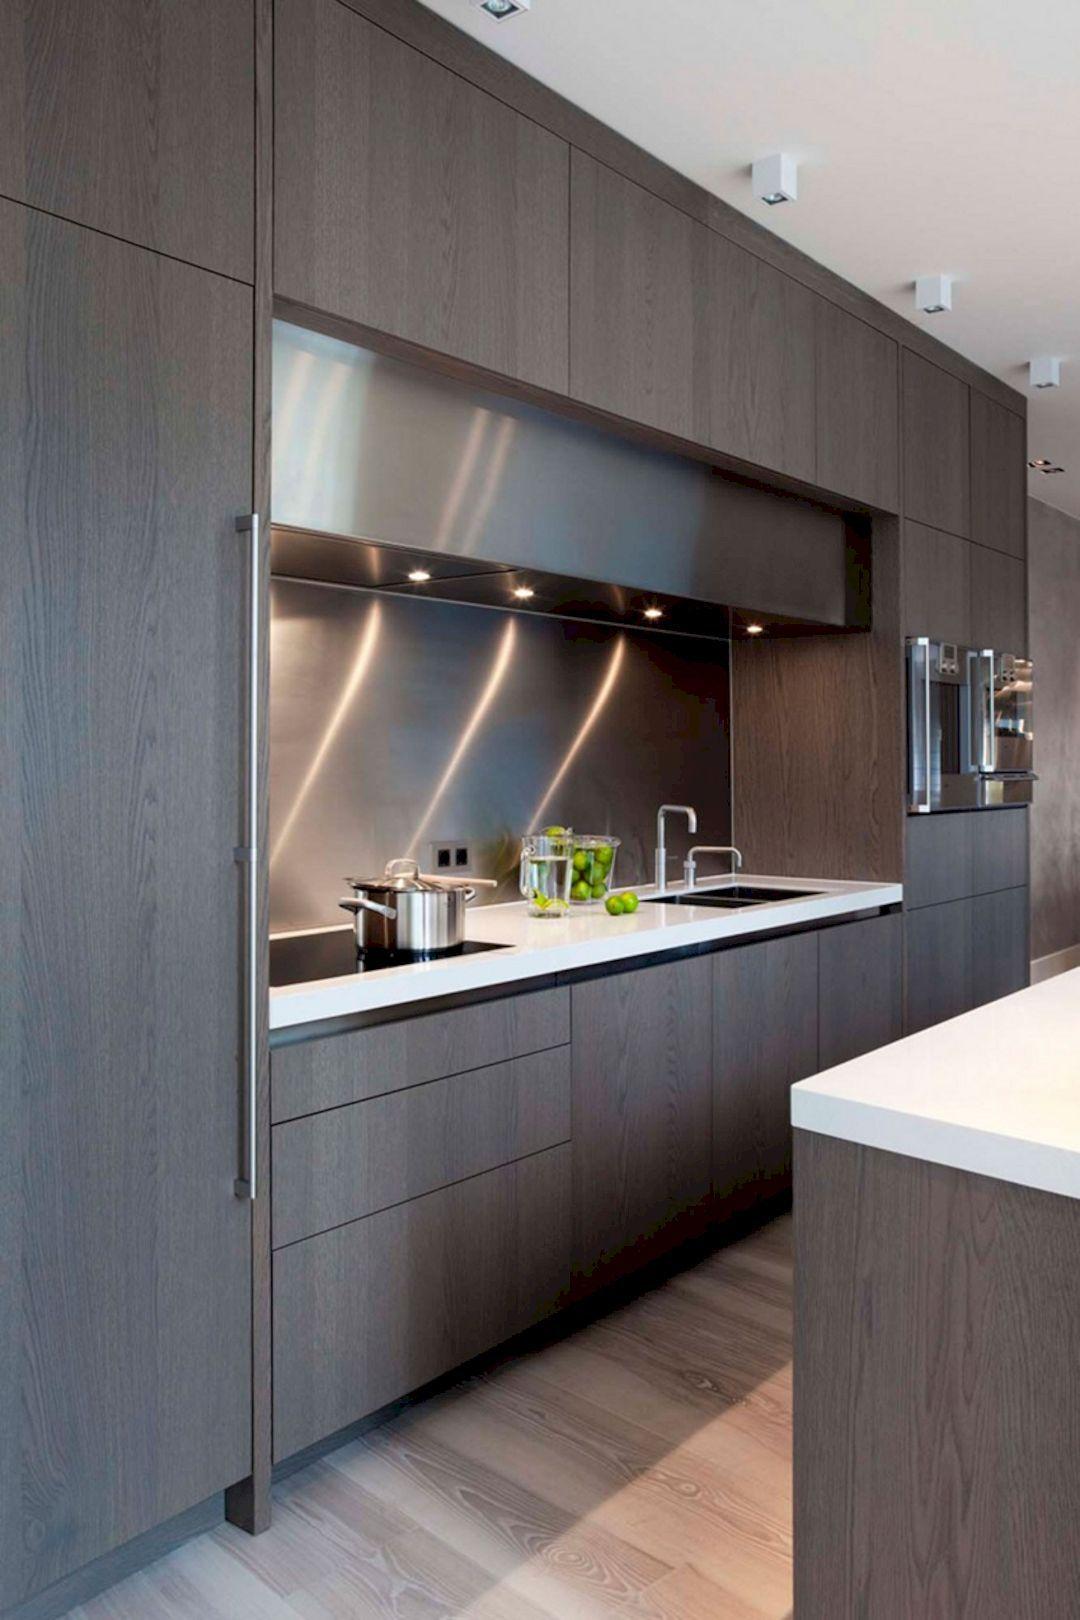 12 Nice Ideas for Your Modern Kitchen Design | Элитные ...